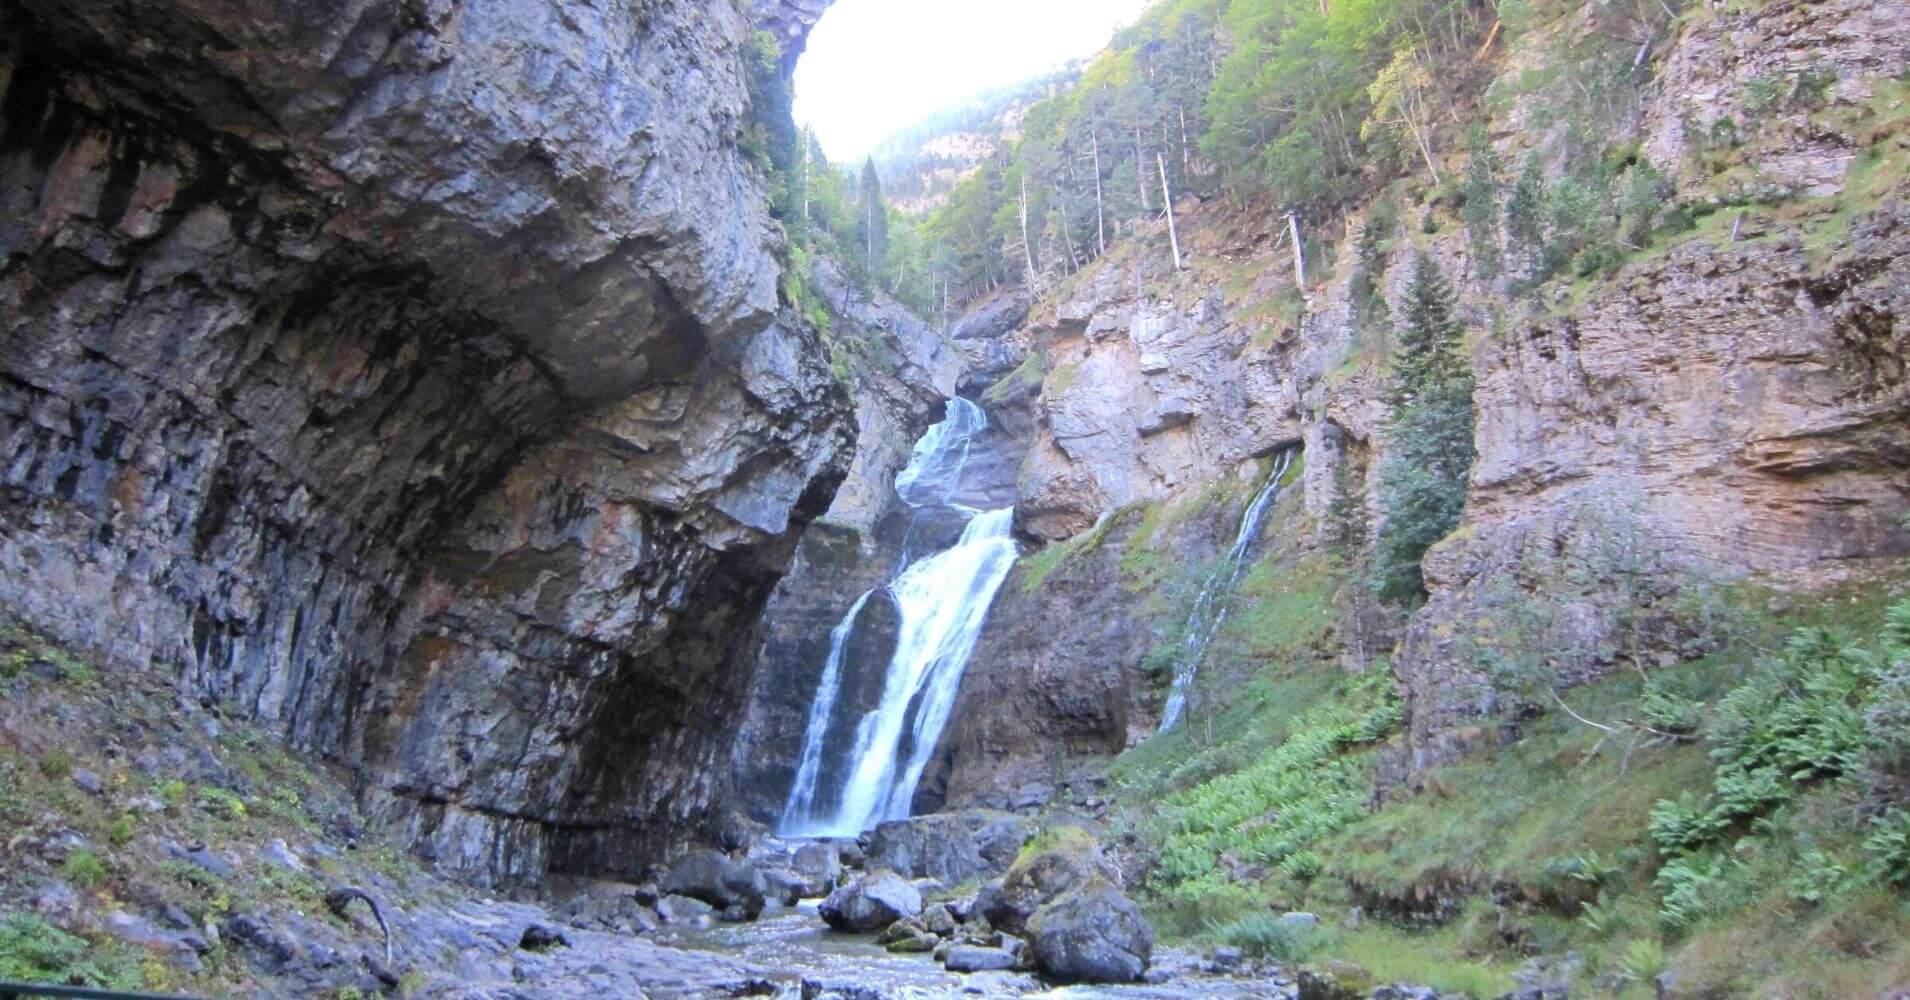 Cascada del Estrecho. Parque Nacional de Ordesa. Huesca.